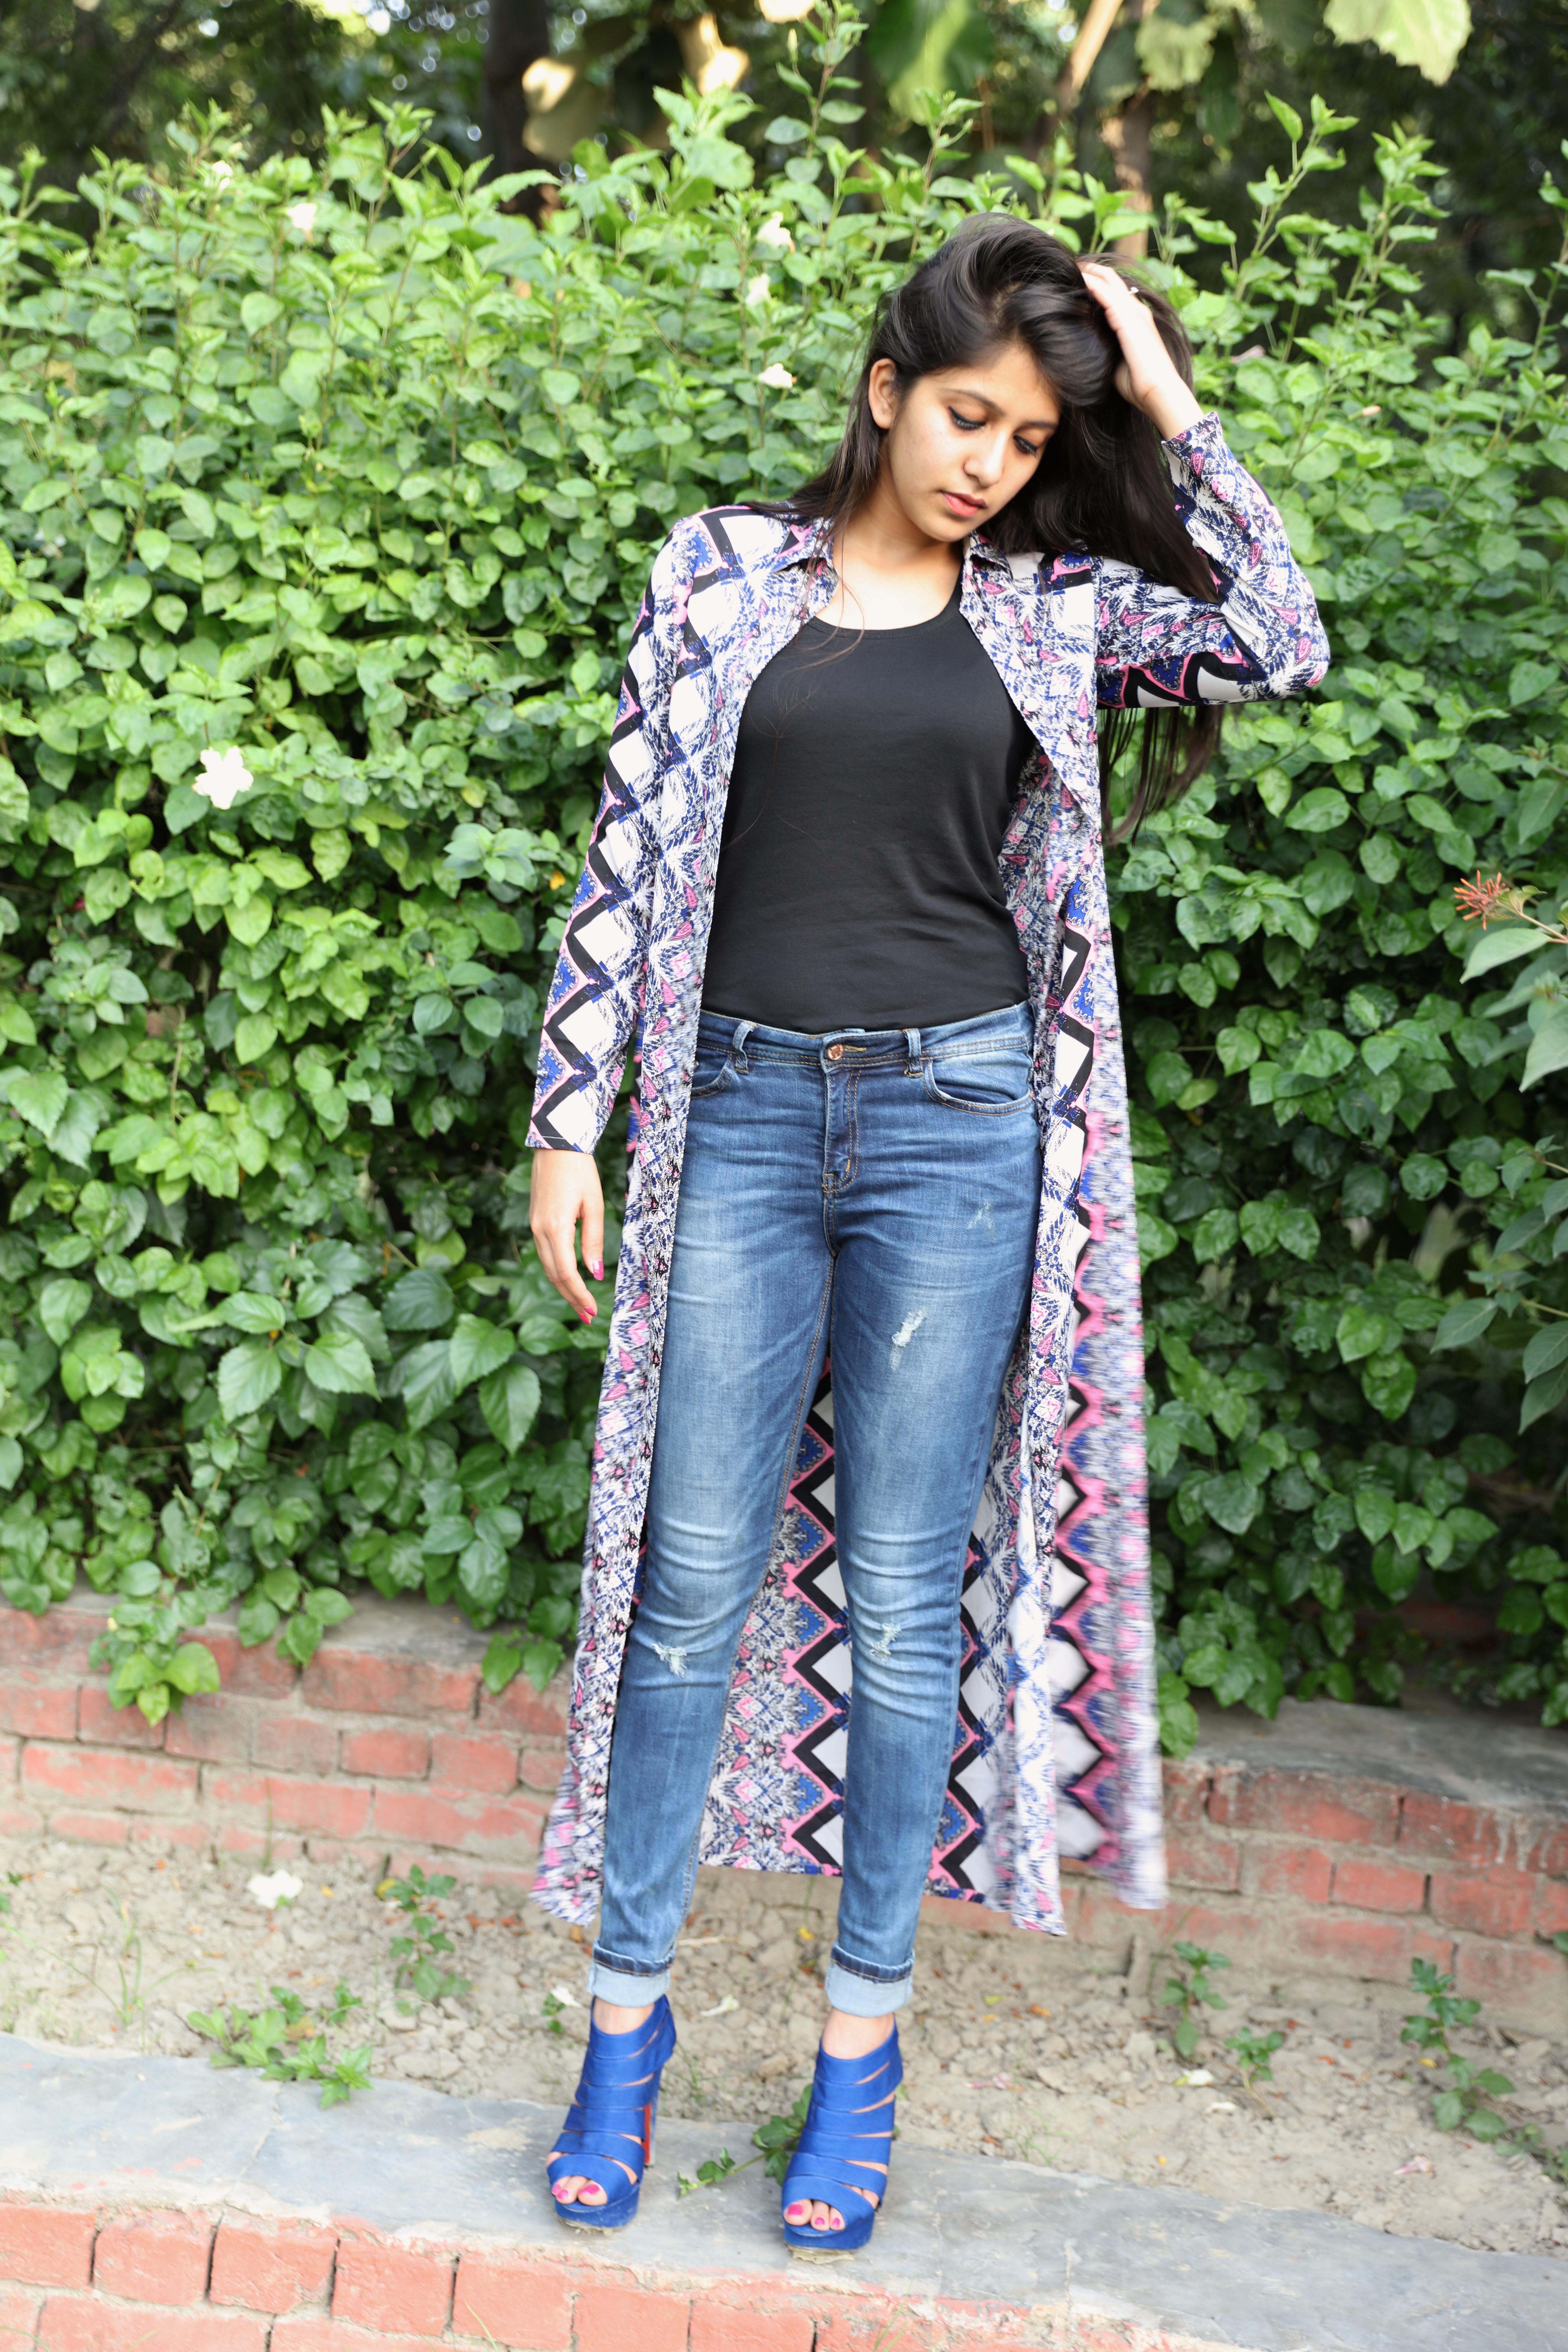 5274f1e6f Jeans: Vero Moda Black top: UCB Heels: Stelatoes, Lajpat Nagar